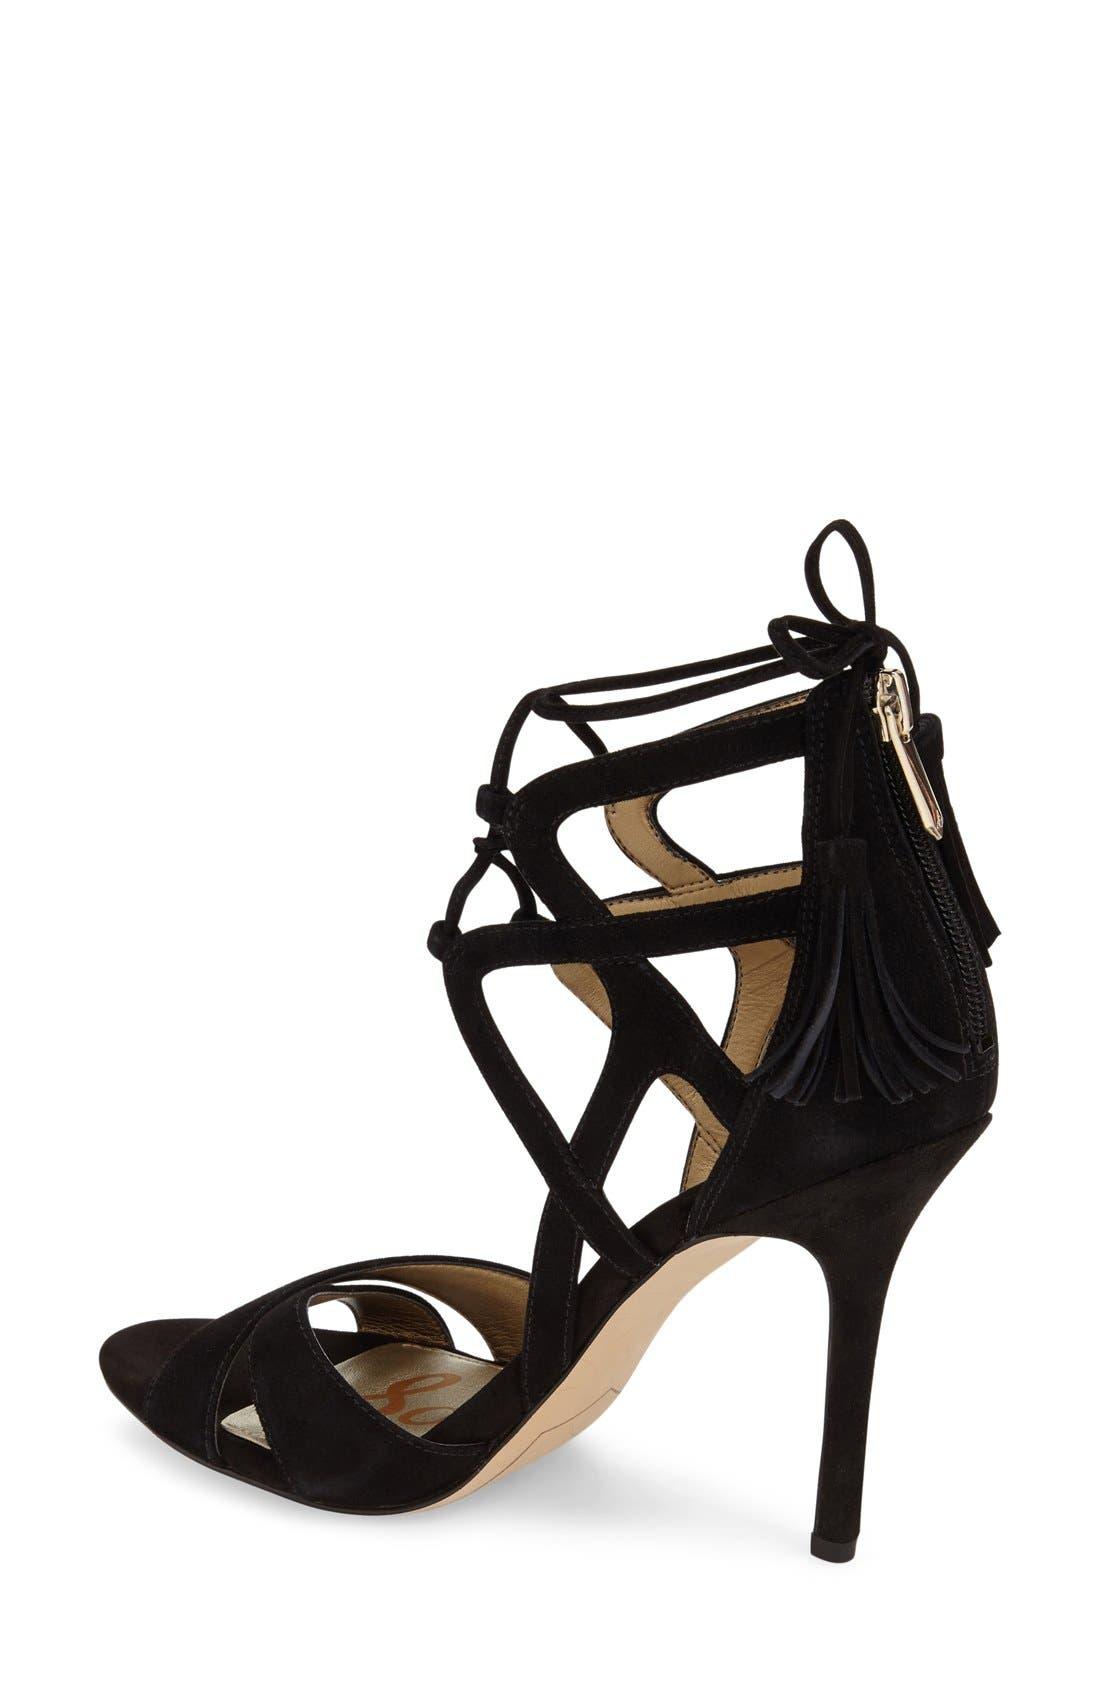 'Azela' Tasseled Lace-Up Sandal,                             Alternate thumbnail 2, color,                             001